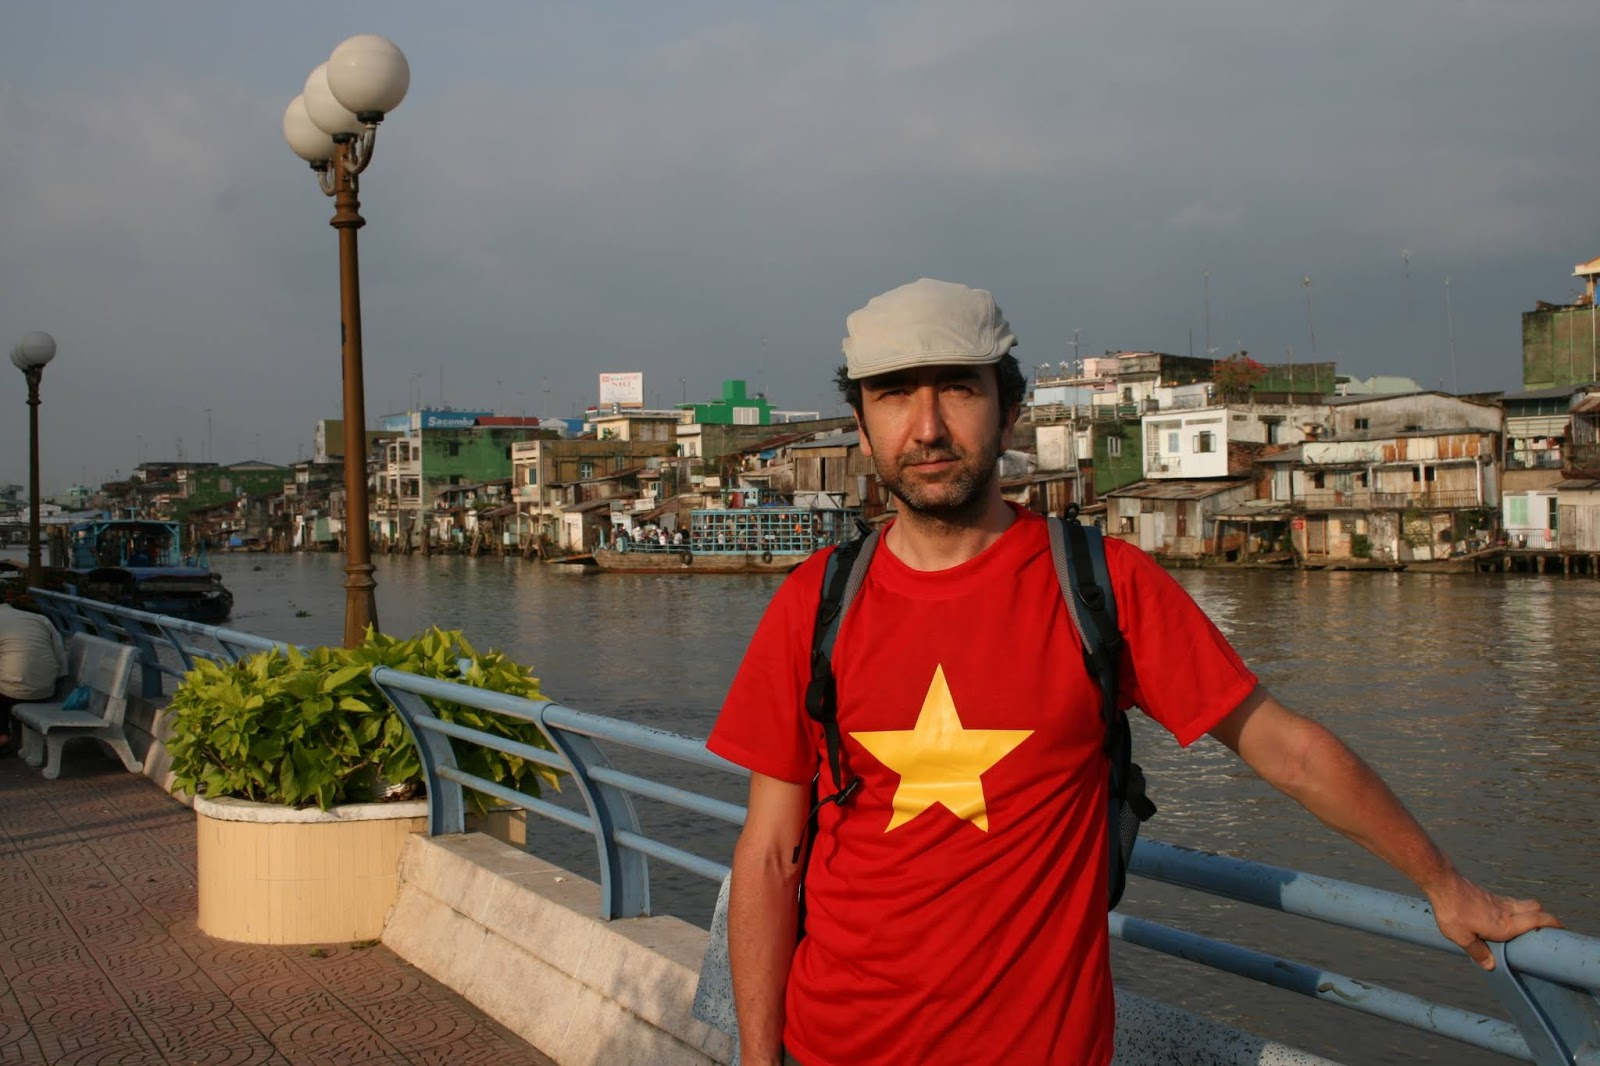 Ho Chi Minh City Tişörtteki Vietnam Bayrağı 🇻🇳